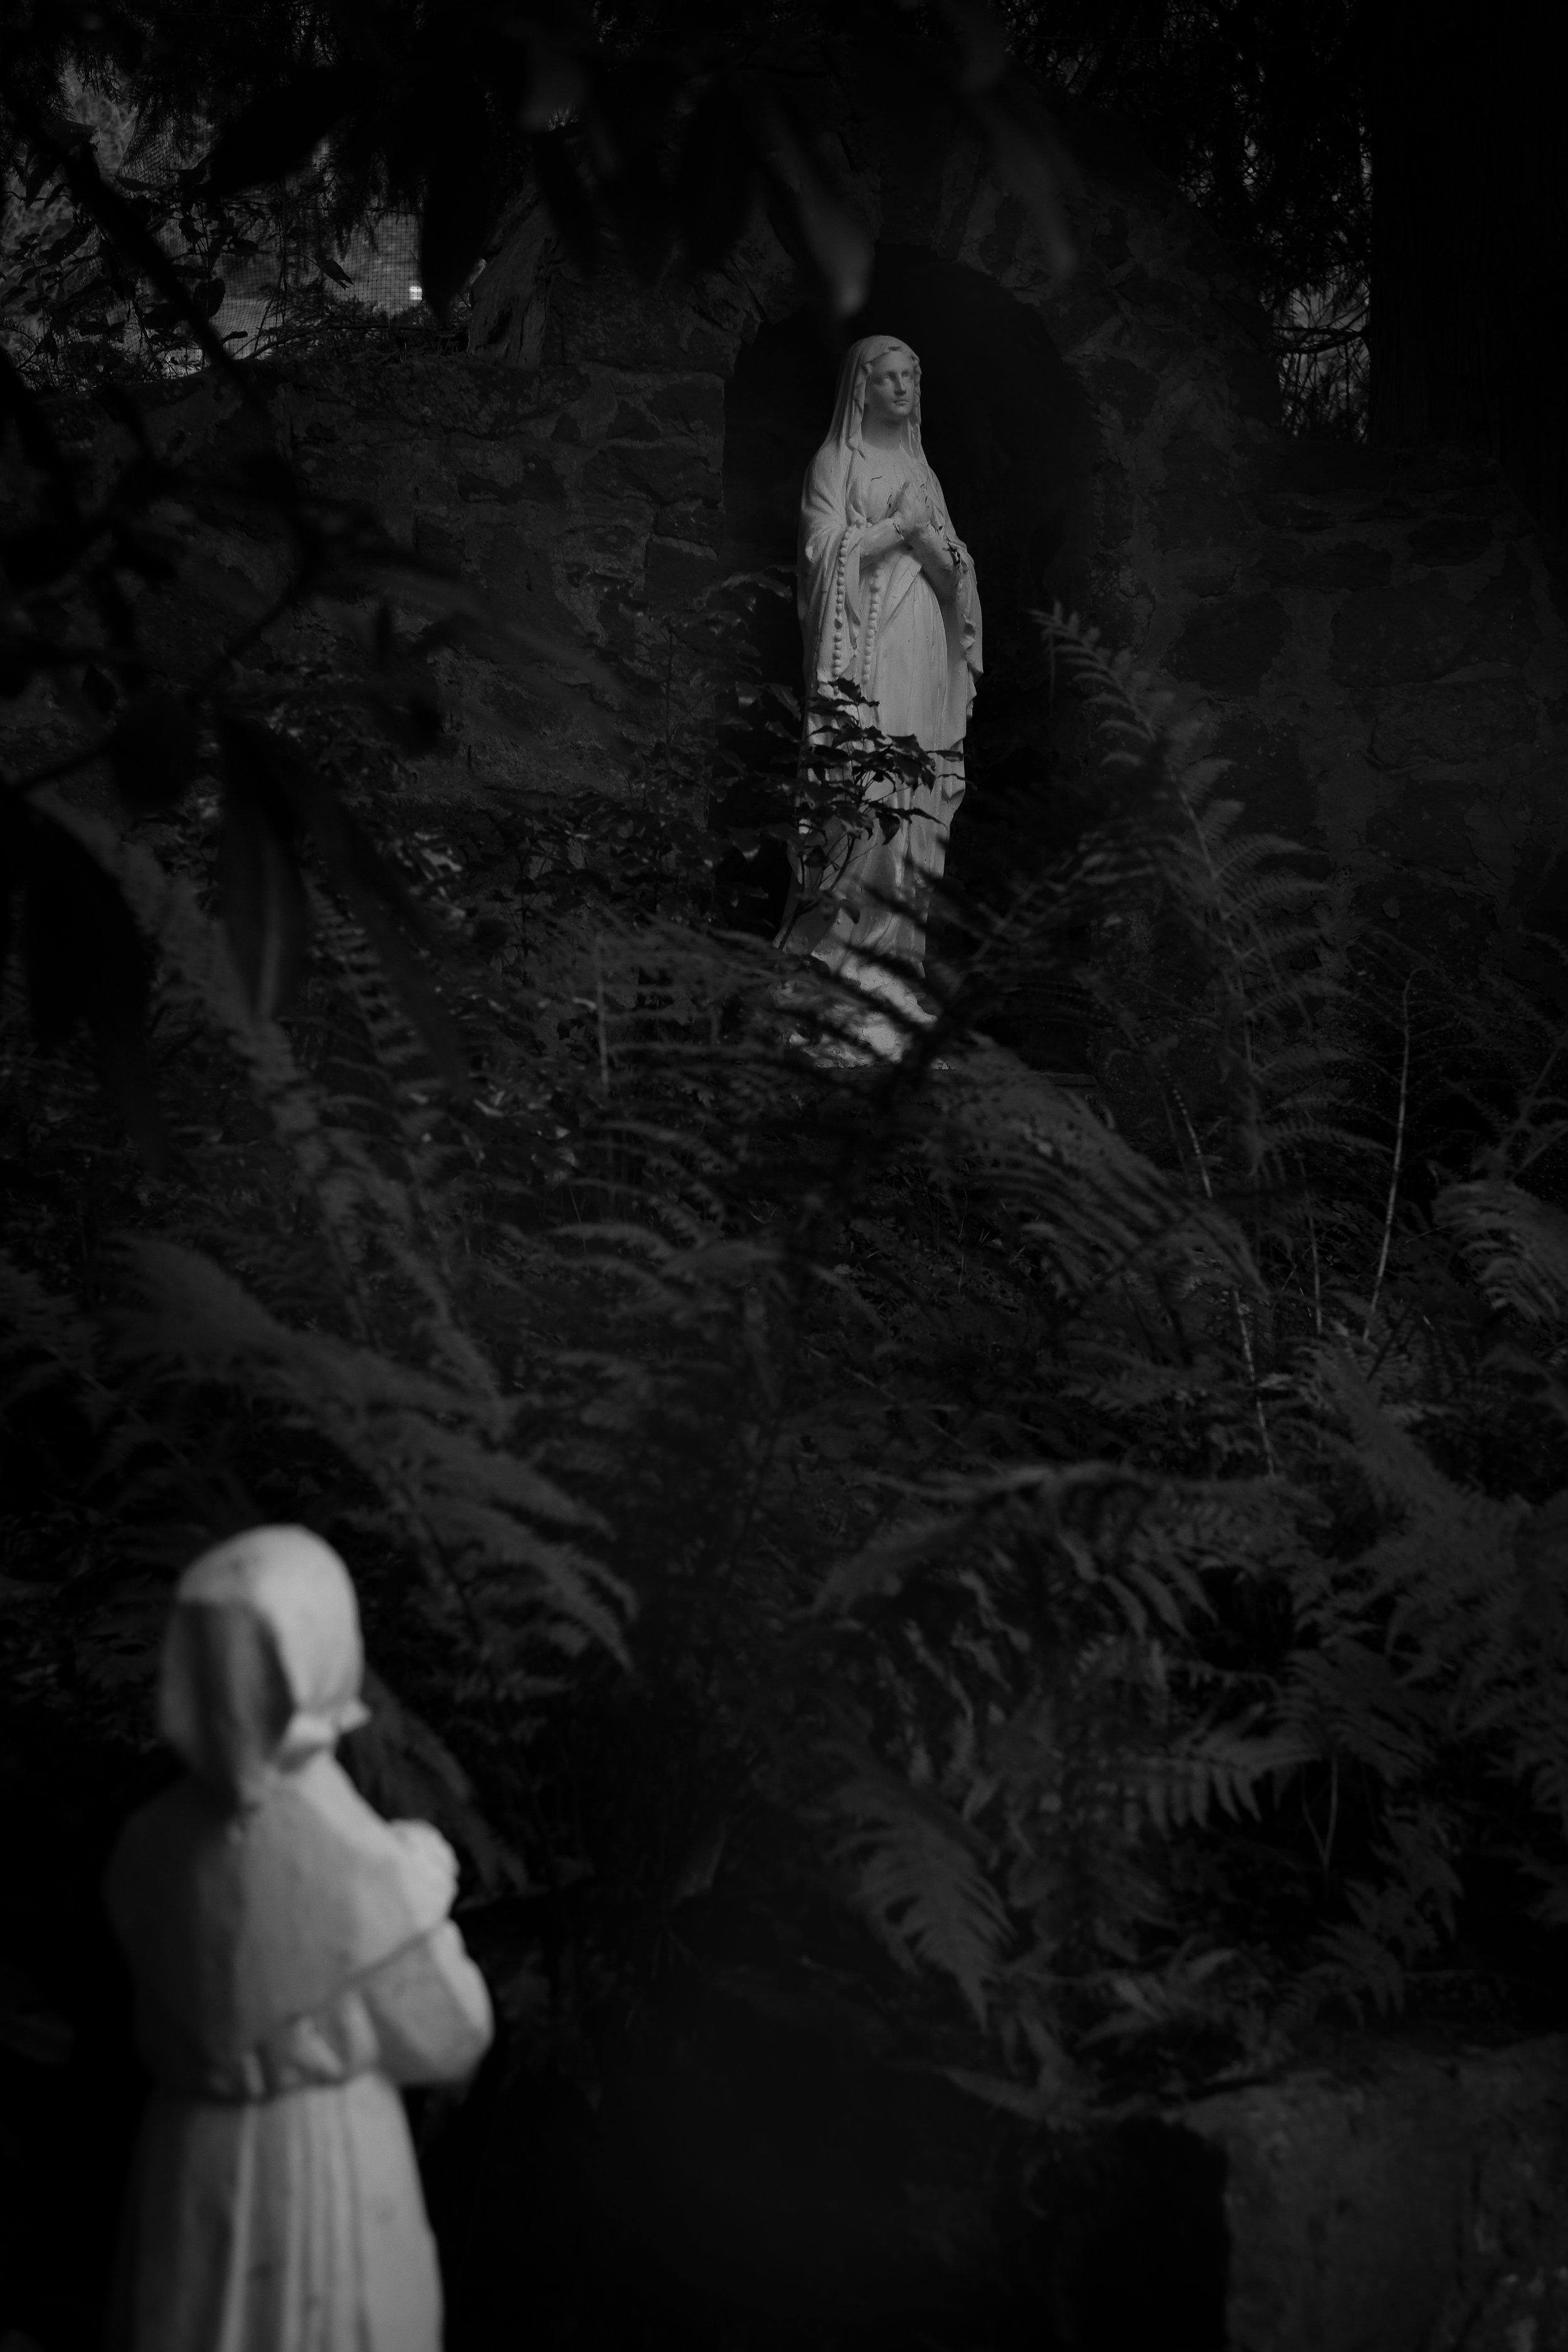 the virgin's grotto   St. Mary's Monastery, Perth, Scotland  November 2016  digital capture